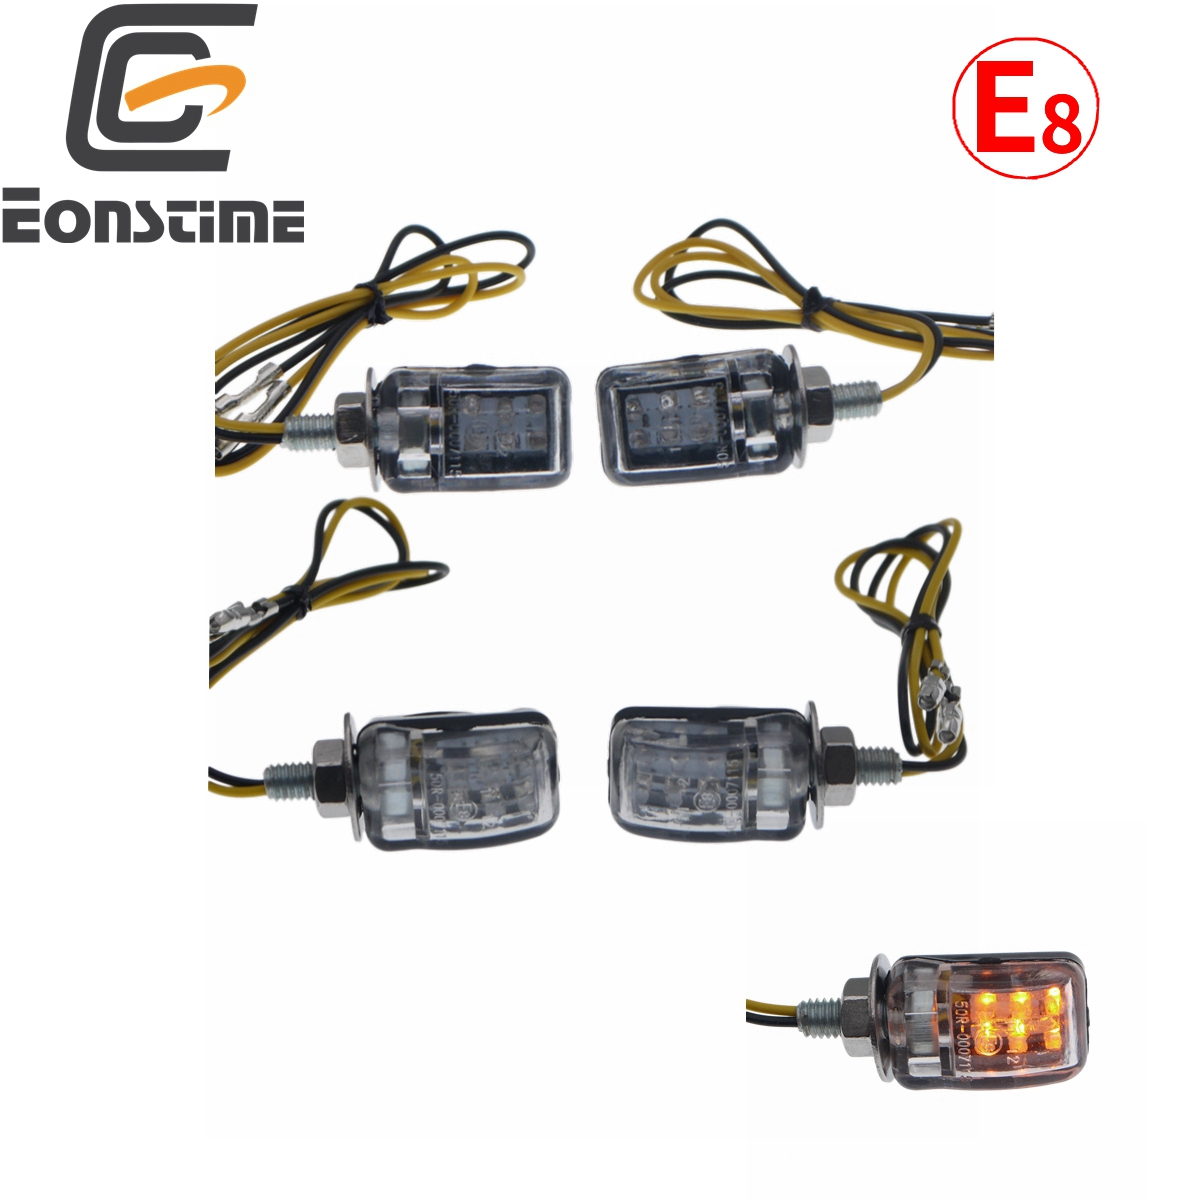 Eonstime 2pcs 12V Mini Turn Signal Light Indicators Motorcycle Bike Flashing Sliver/Black 6 LED Indicator Blinker Amber